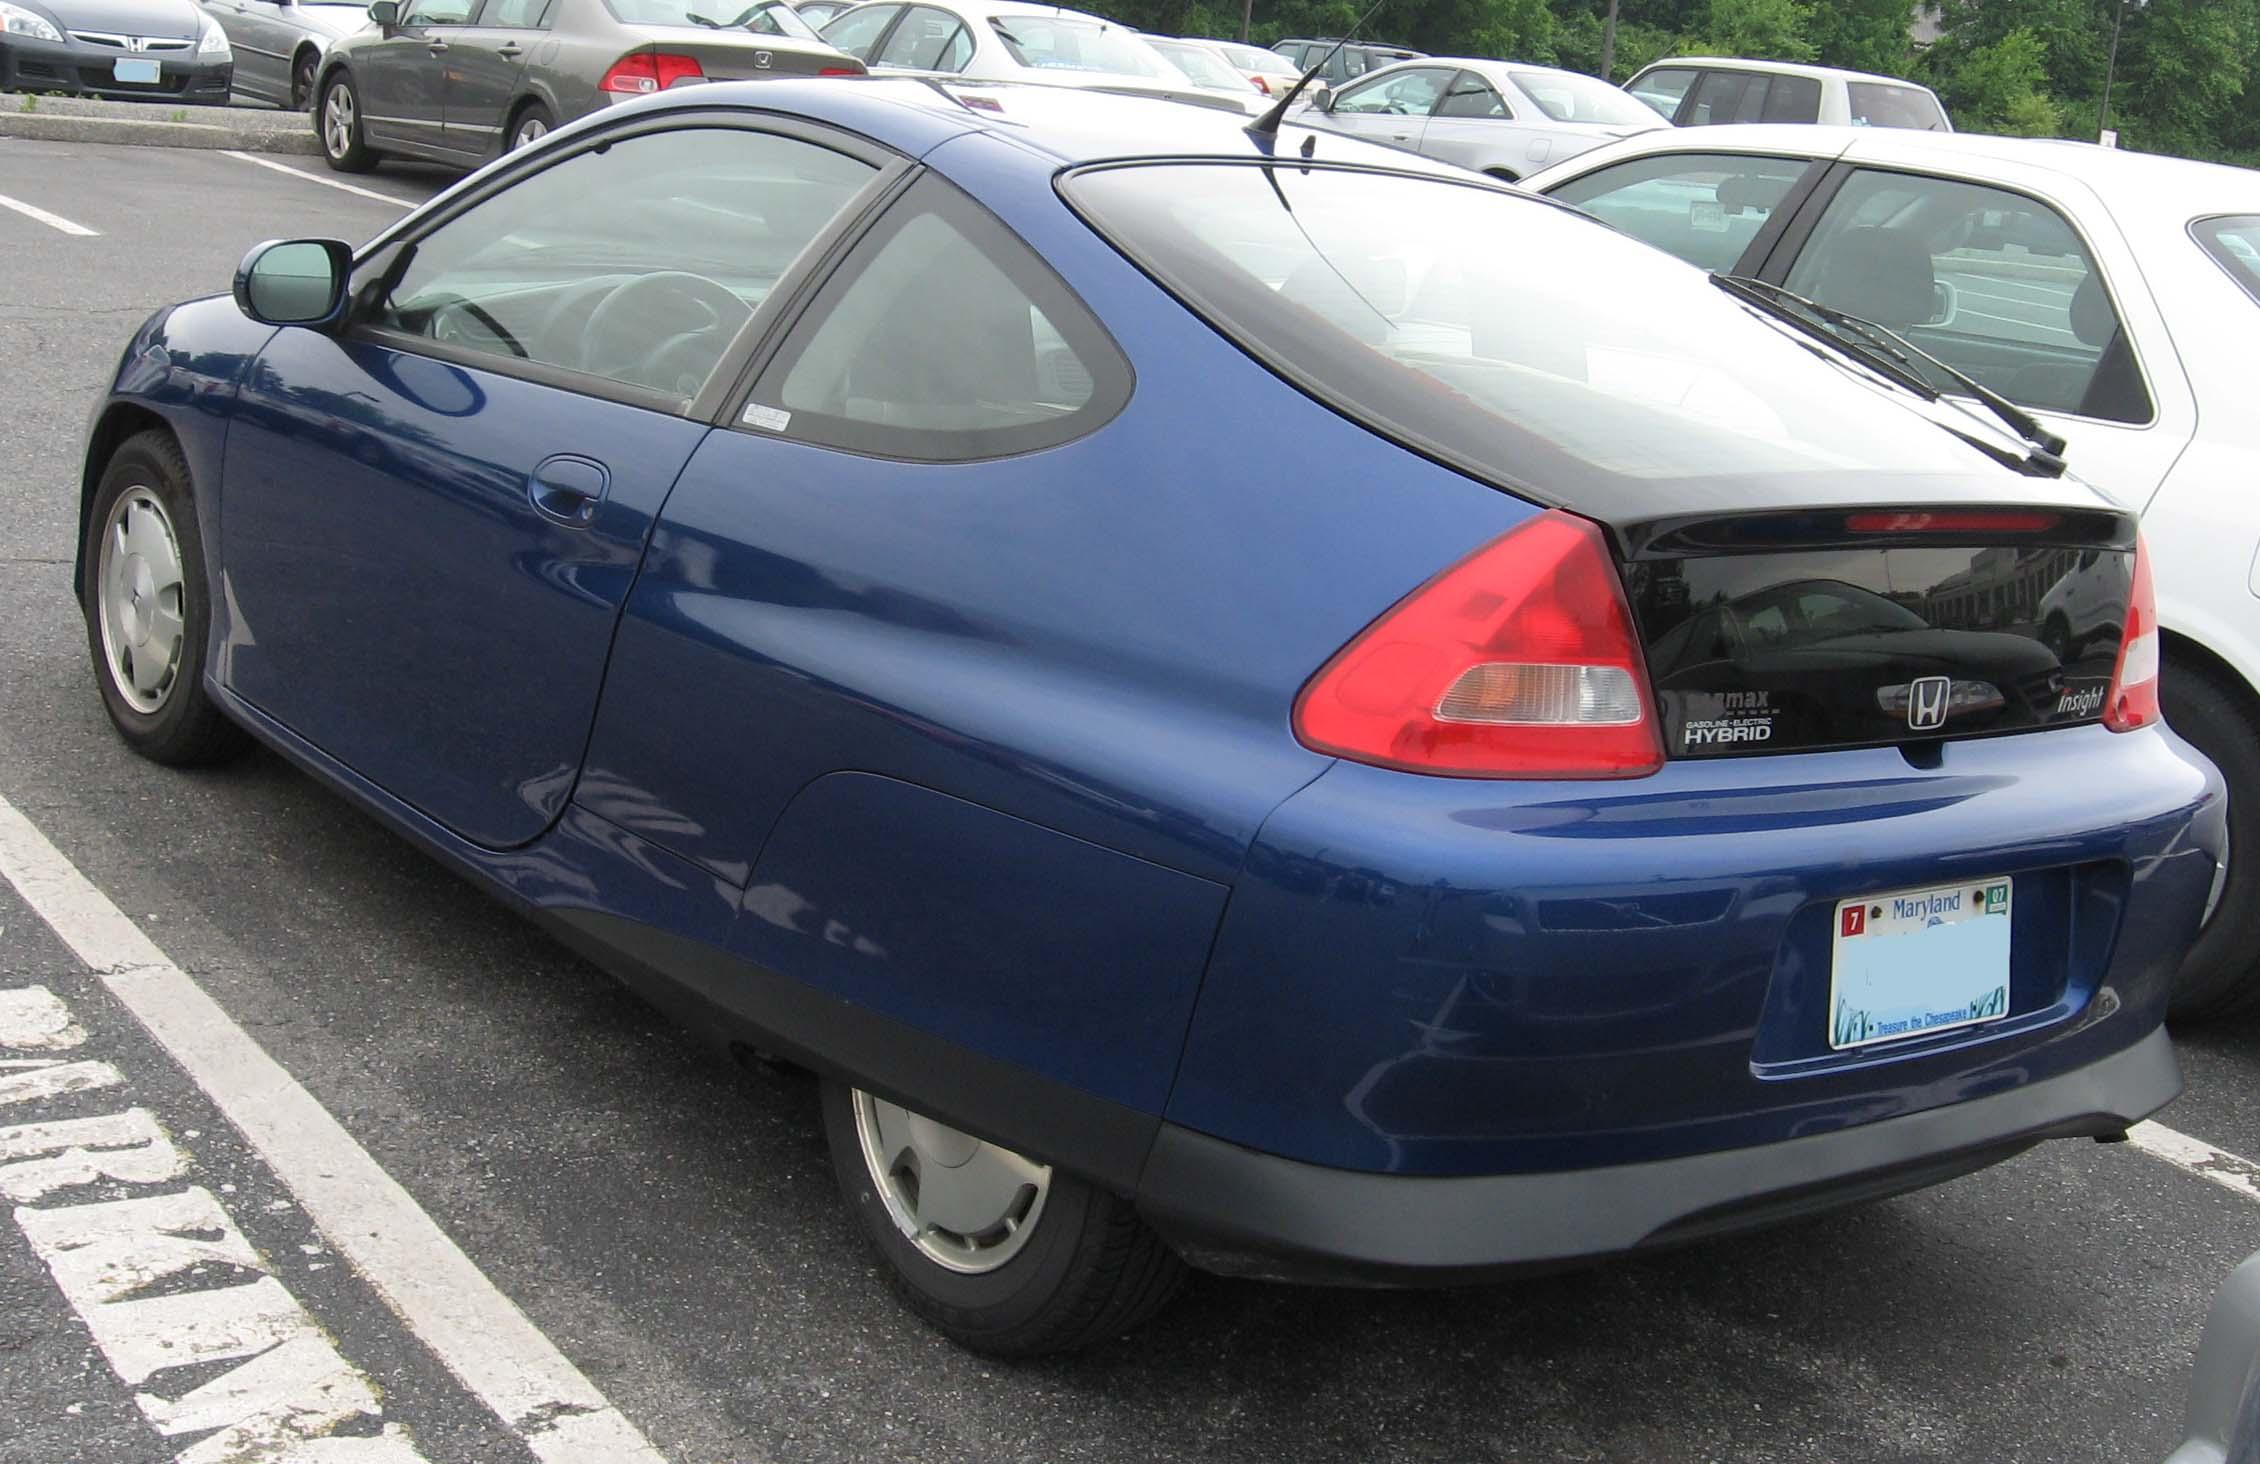 Datei:Honda-Insight-Rear.jpg - Wikipedia